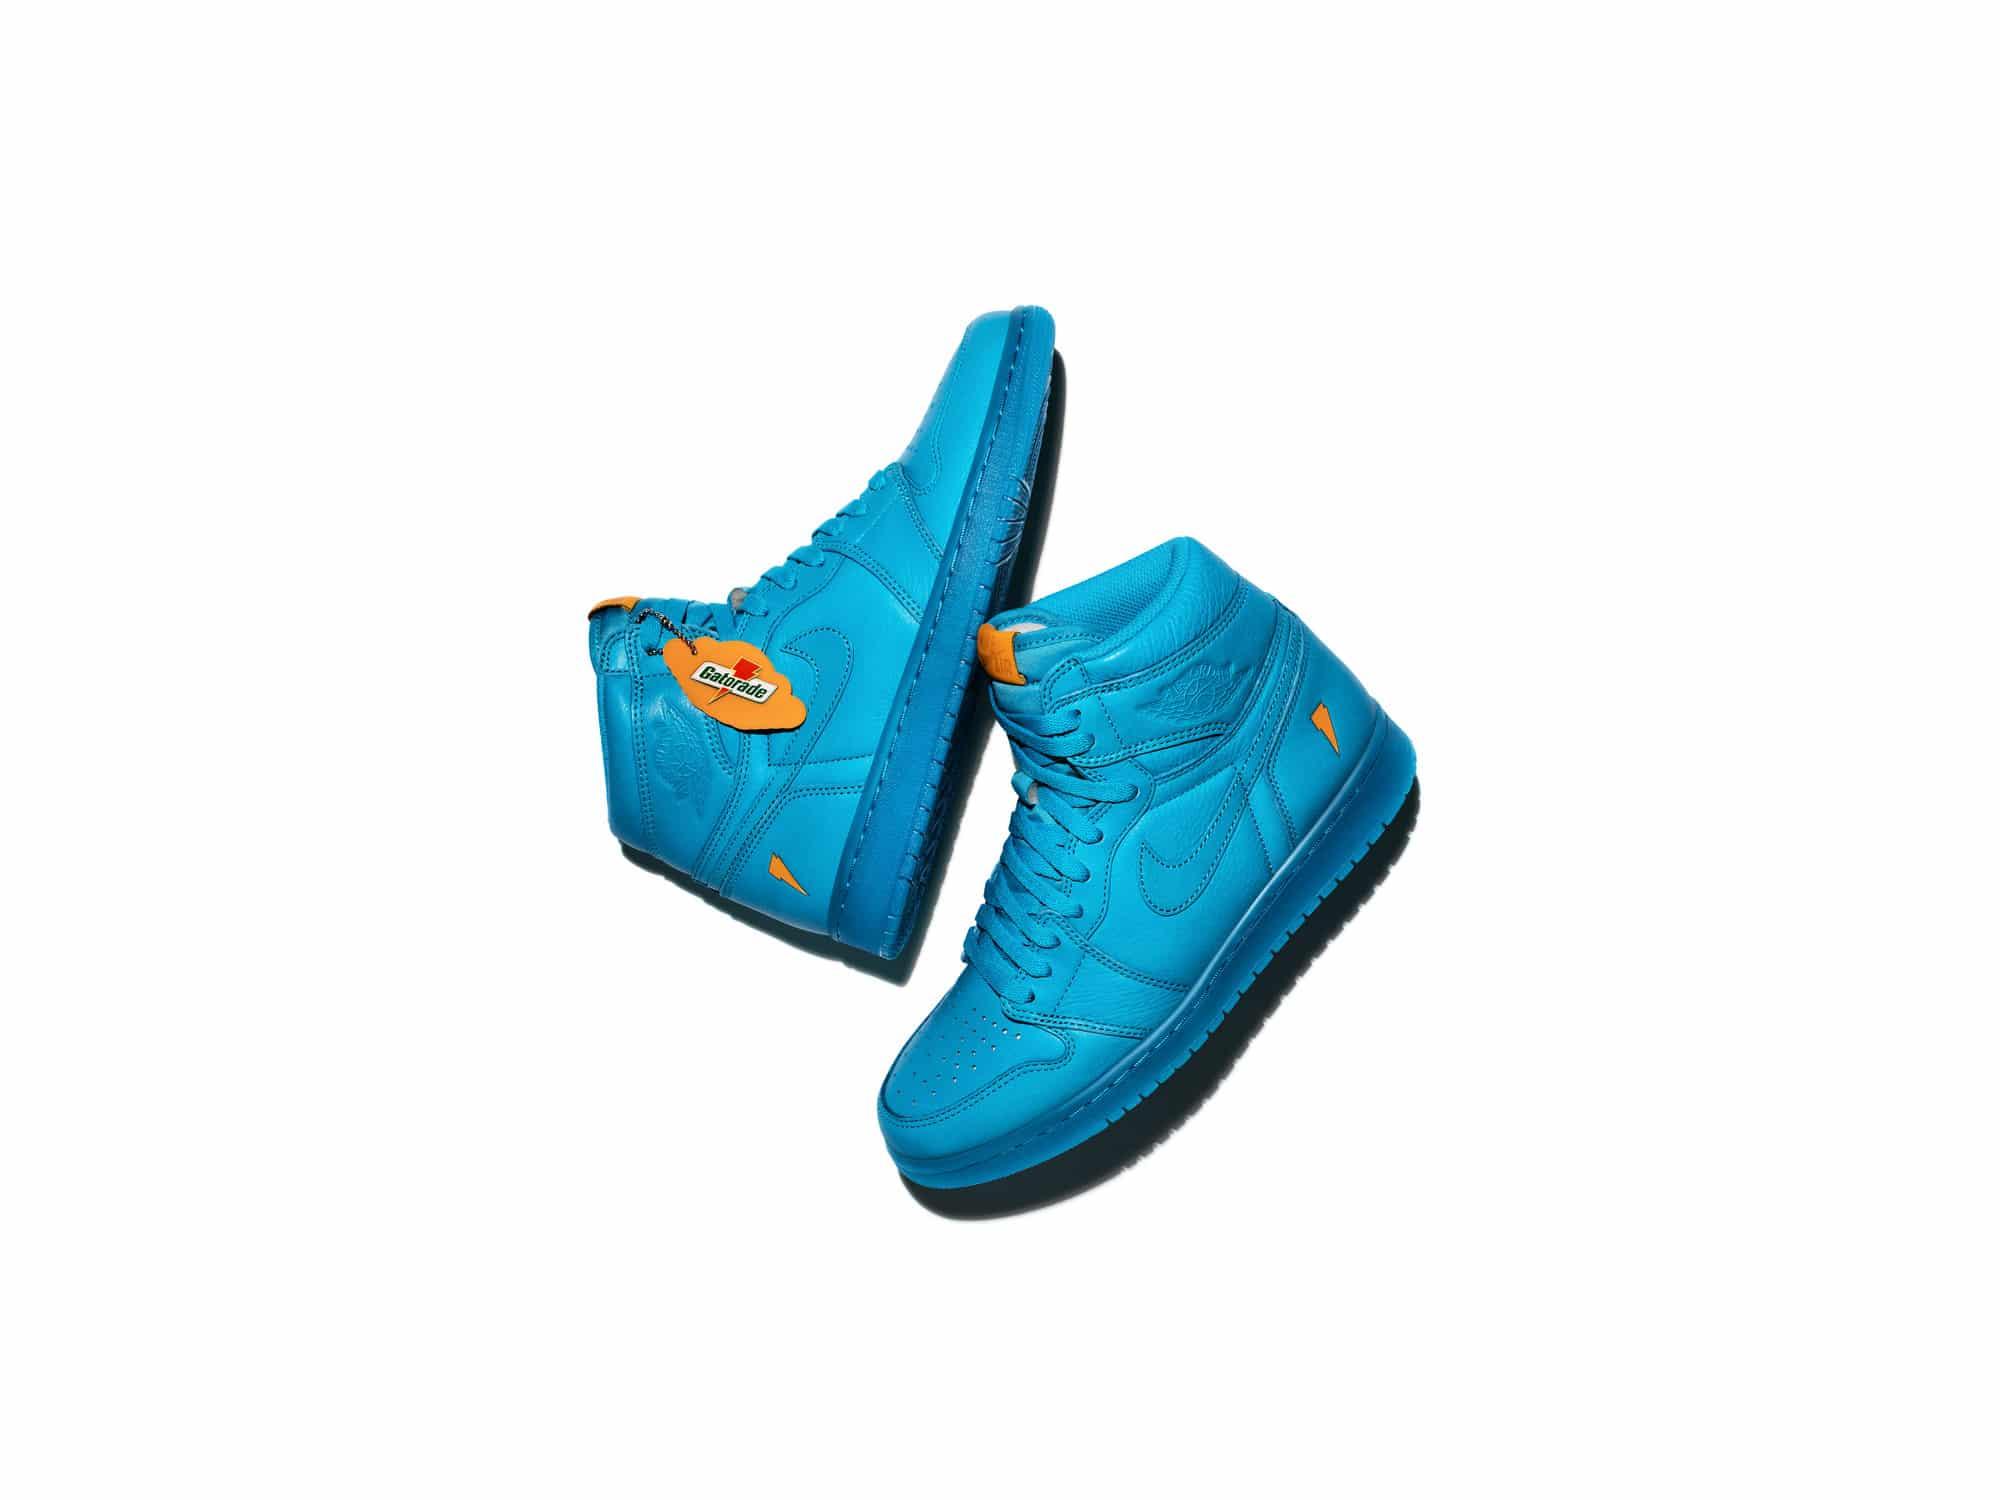 d2a0c56b5ad25b Air Jordan 6 NRG  Gatorade  Available 12.30